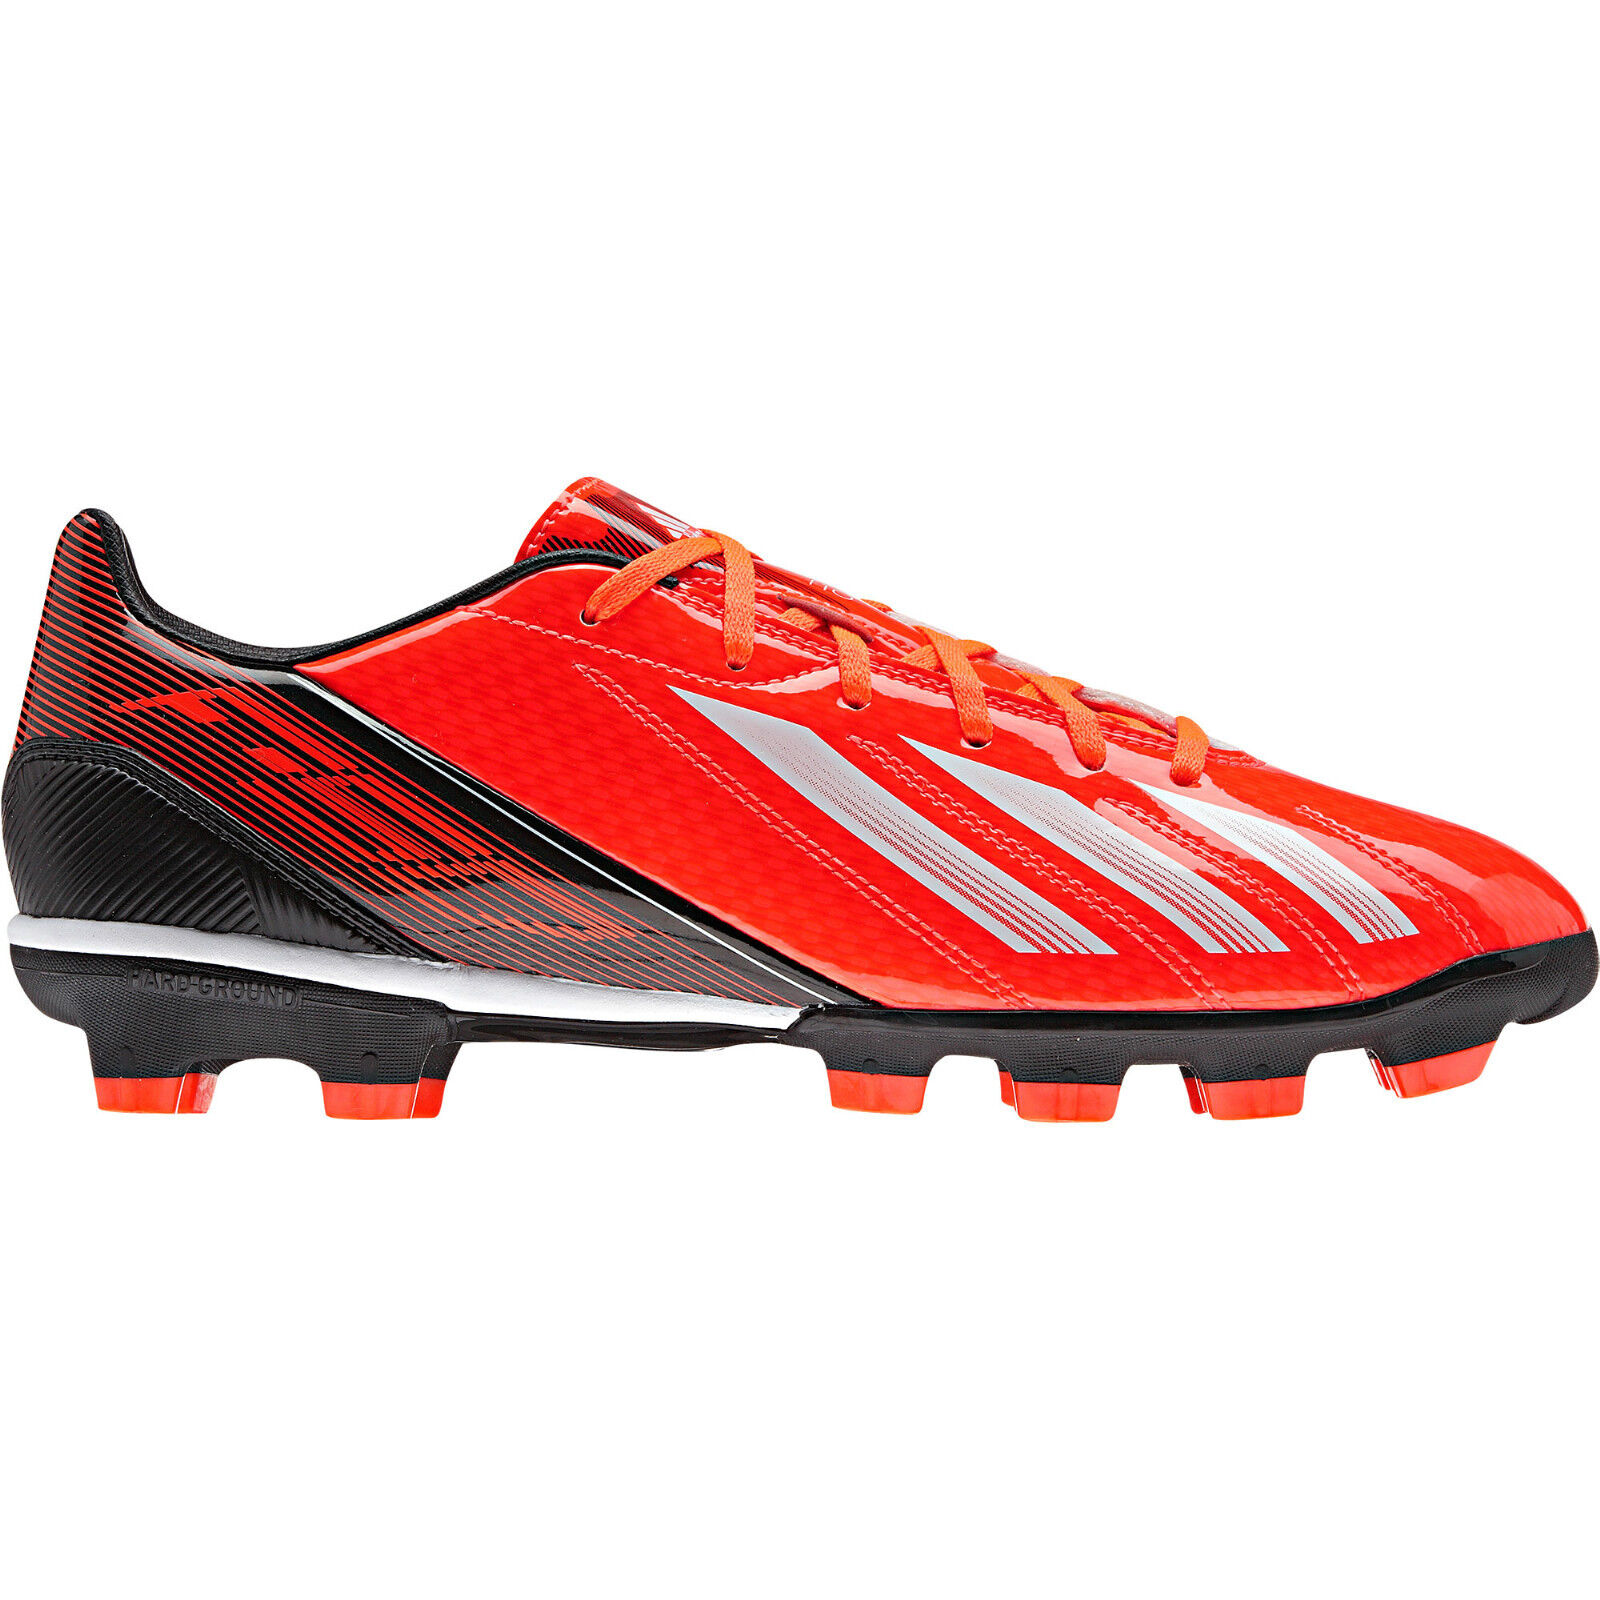 finest selection cdf54 314ab Adidas Adidas Adidas Uomo F10 TRX HG HARD Ground football stivali ROSSO NERO  TAGLIA 8 9 10 10,5 11 9198f3